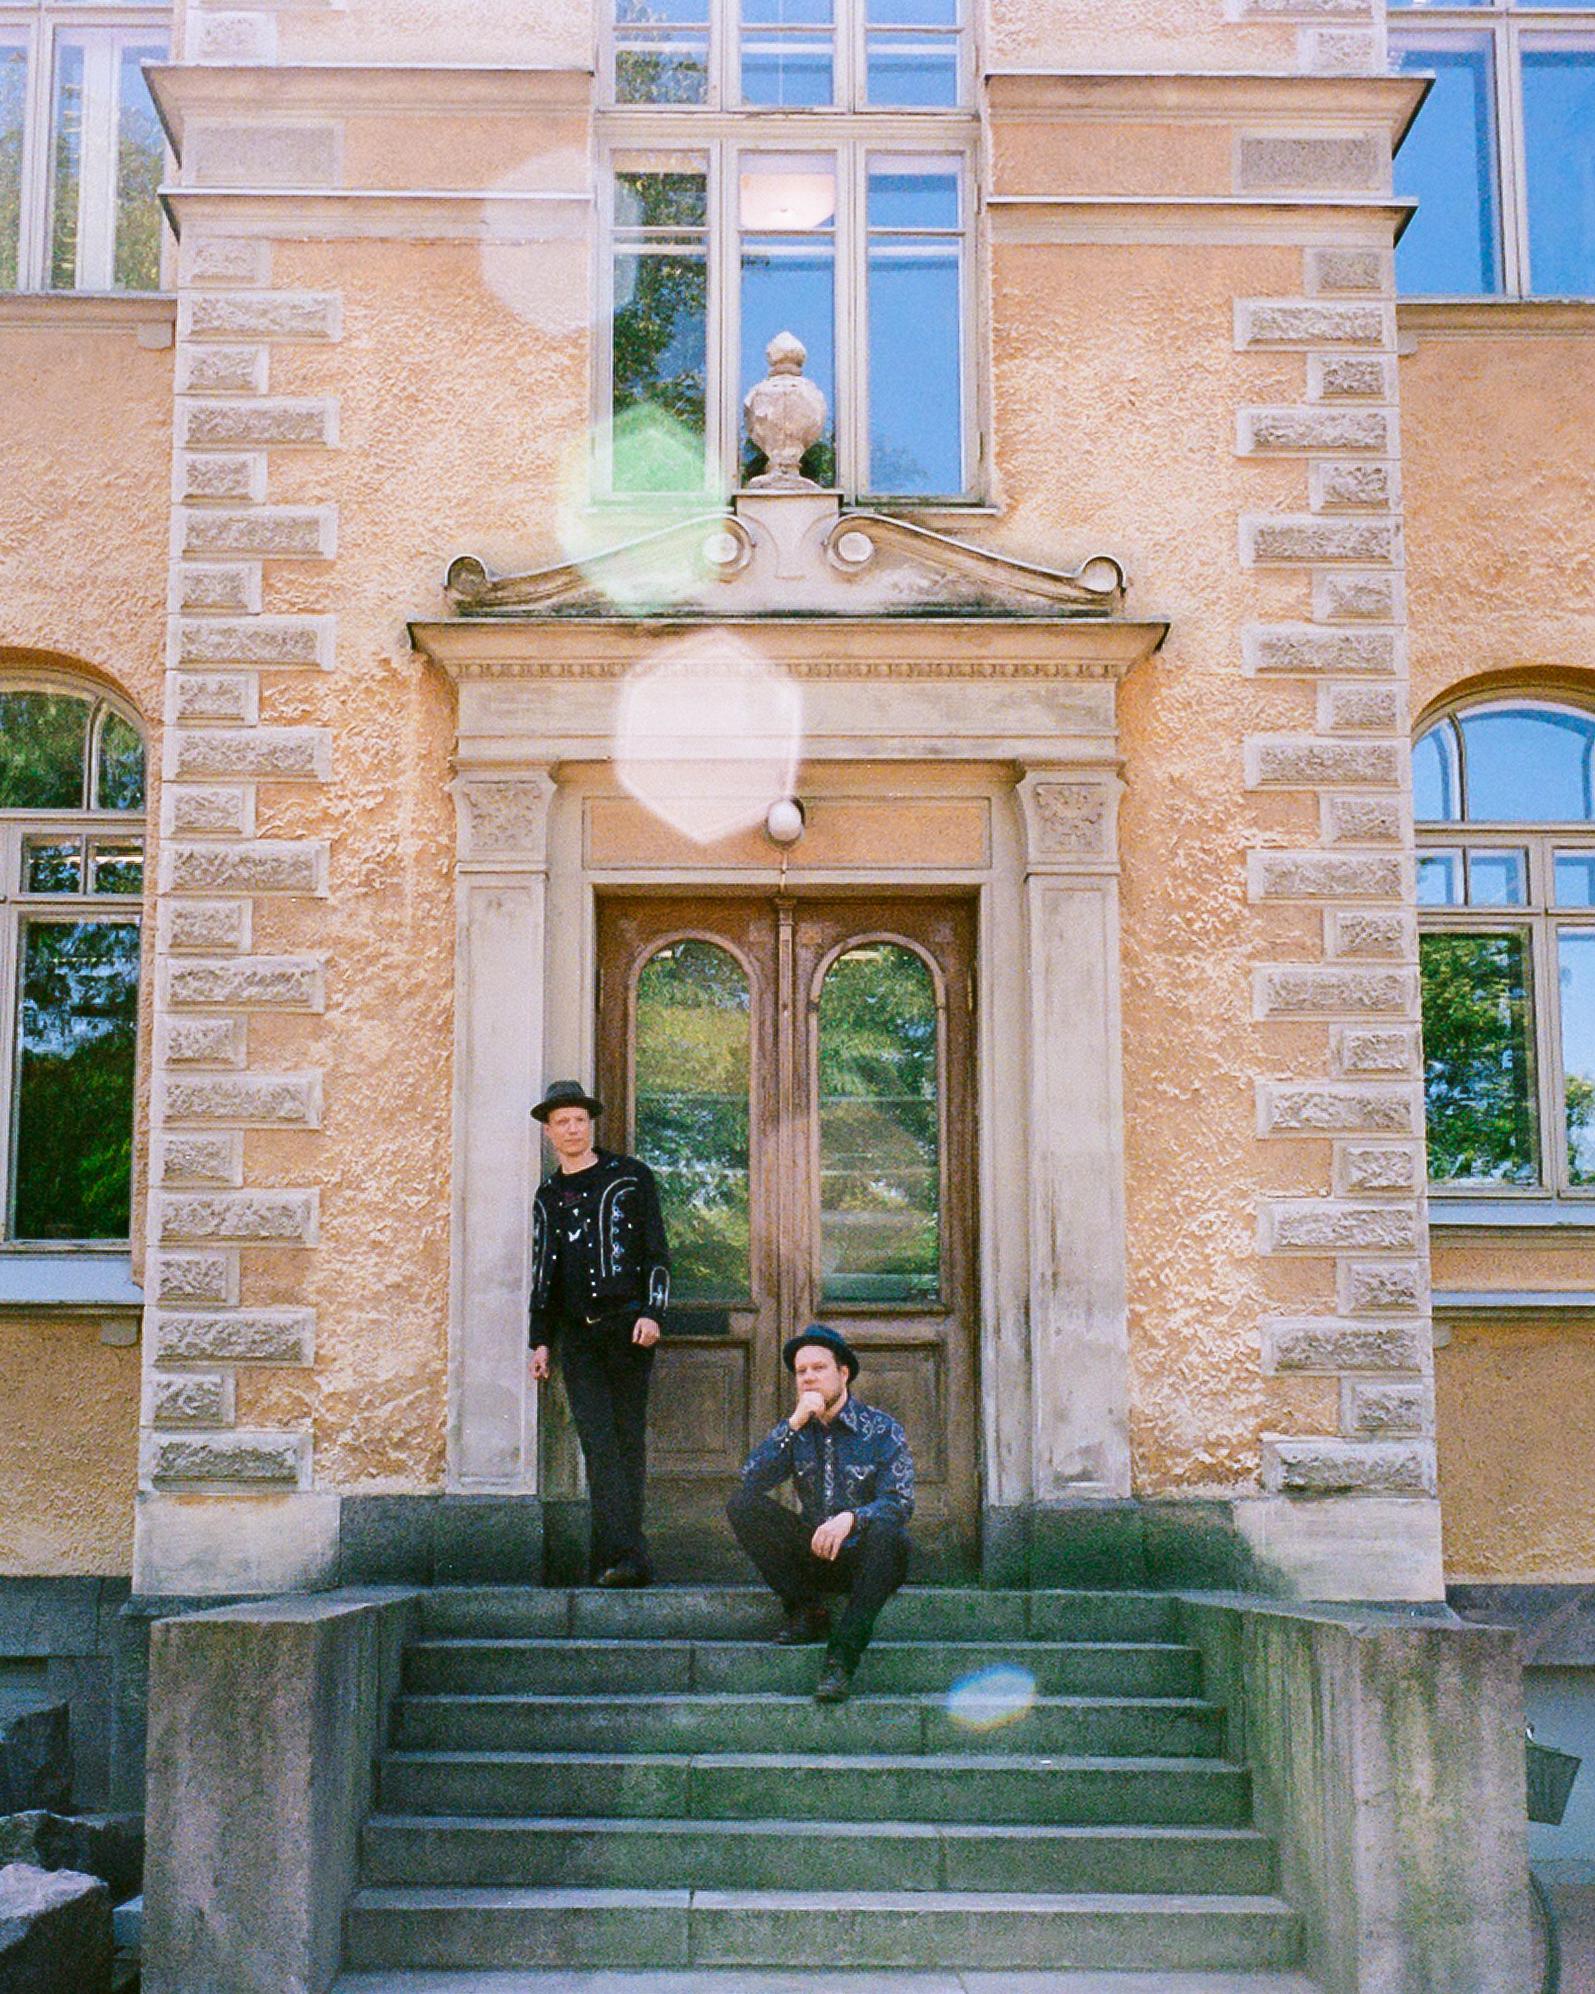 tuomo-markus-0018-photo-tero-ahonen.jpg